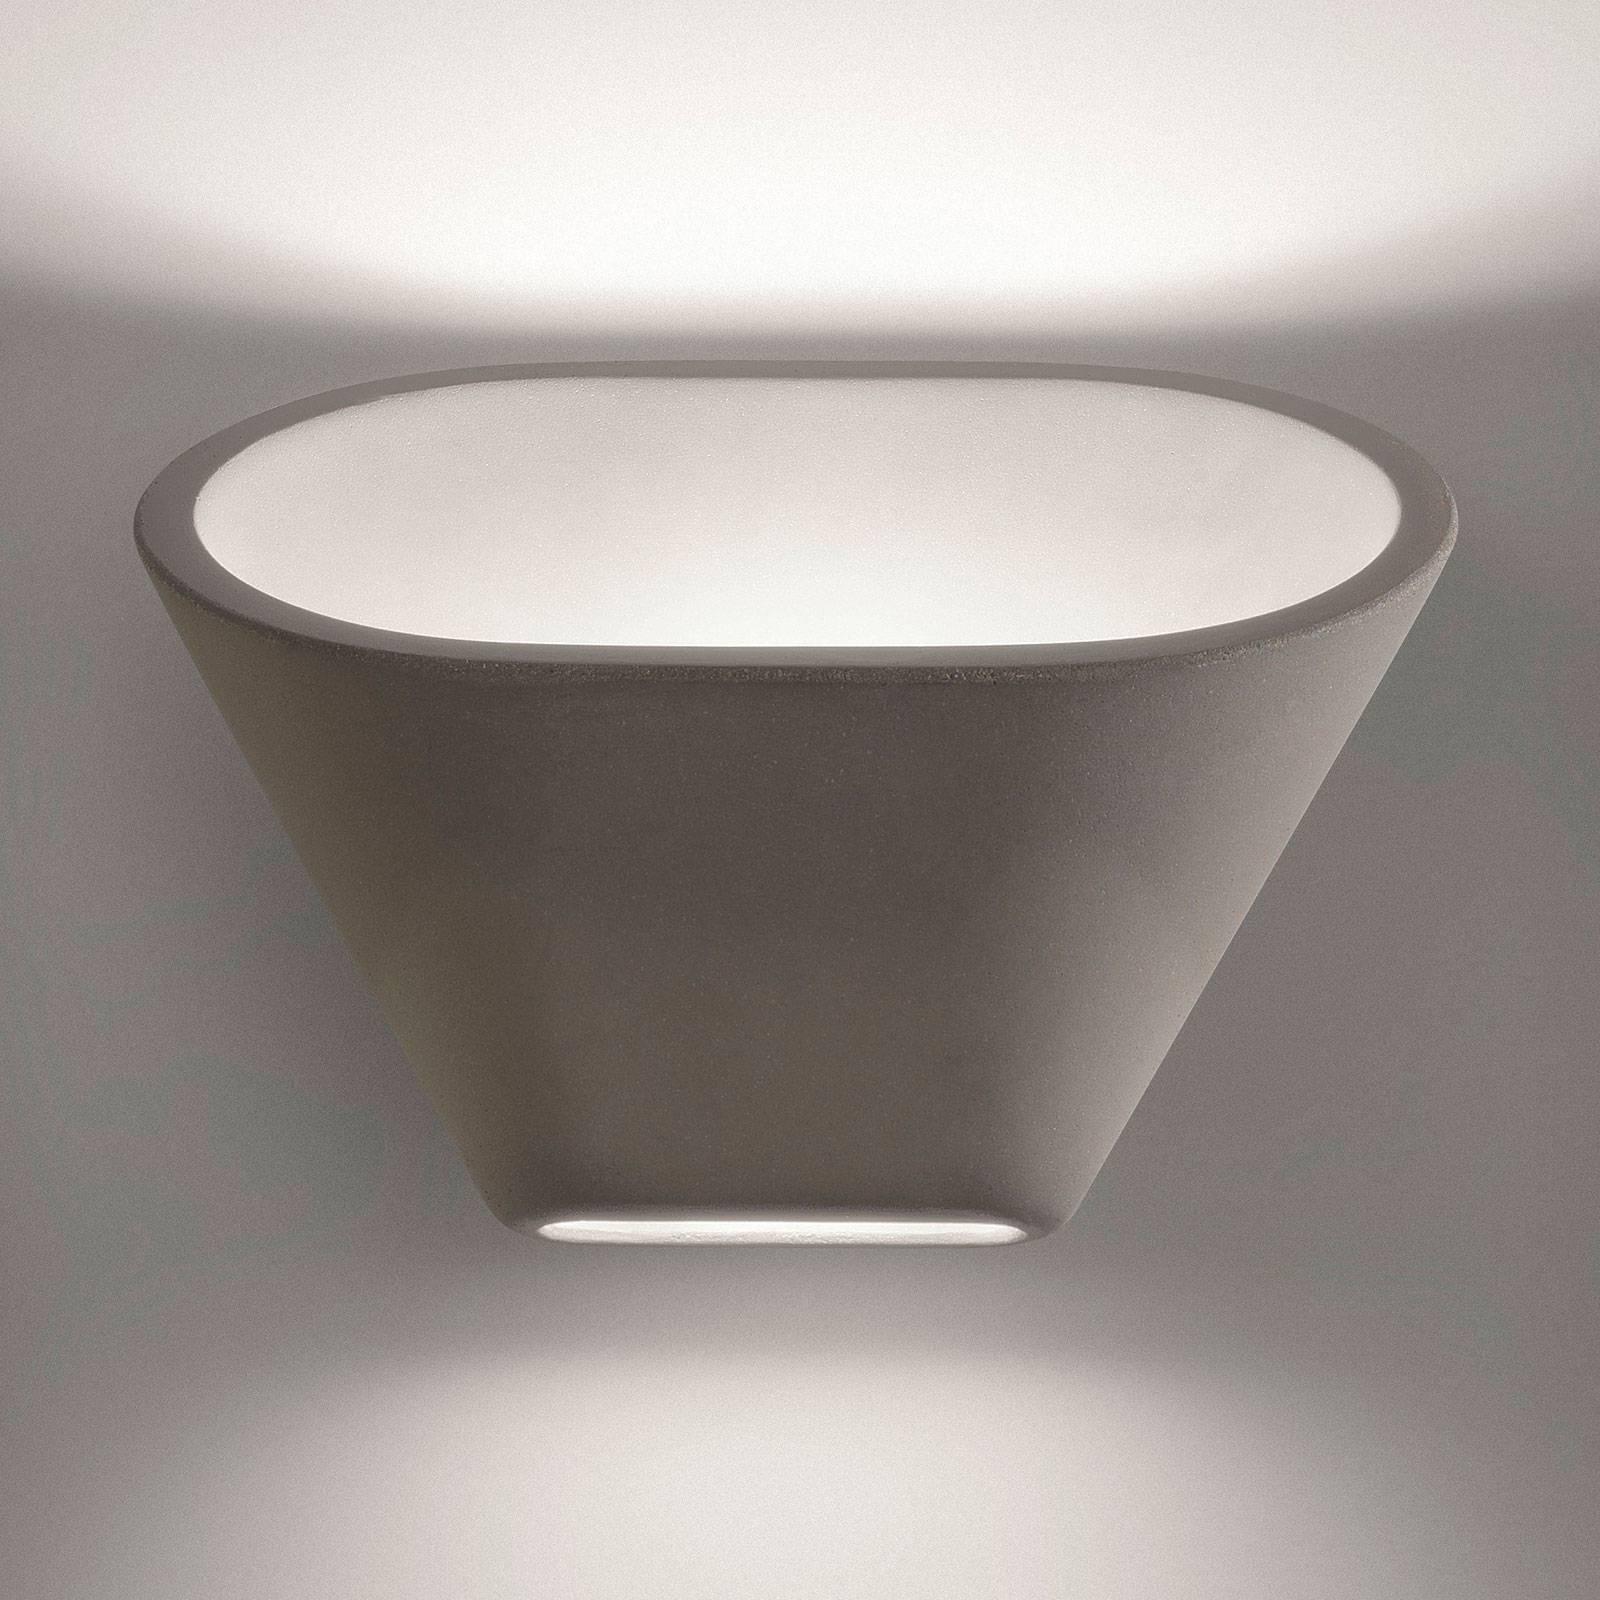 Foscarini Aplomb LED-Wandleuchte, dimmbar, grau